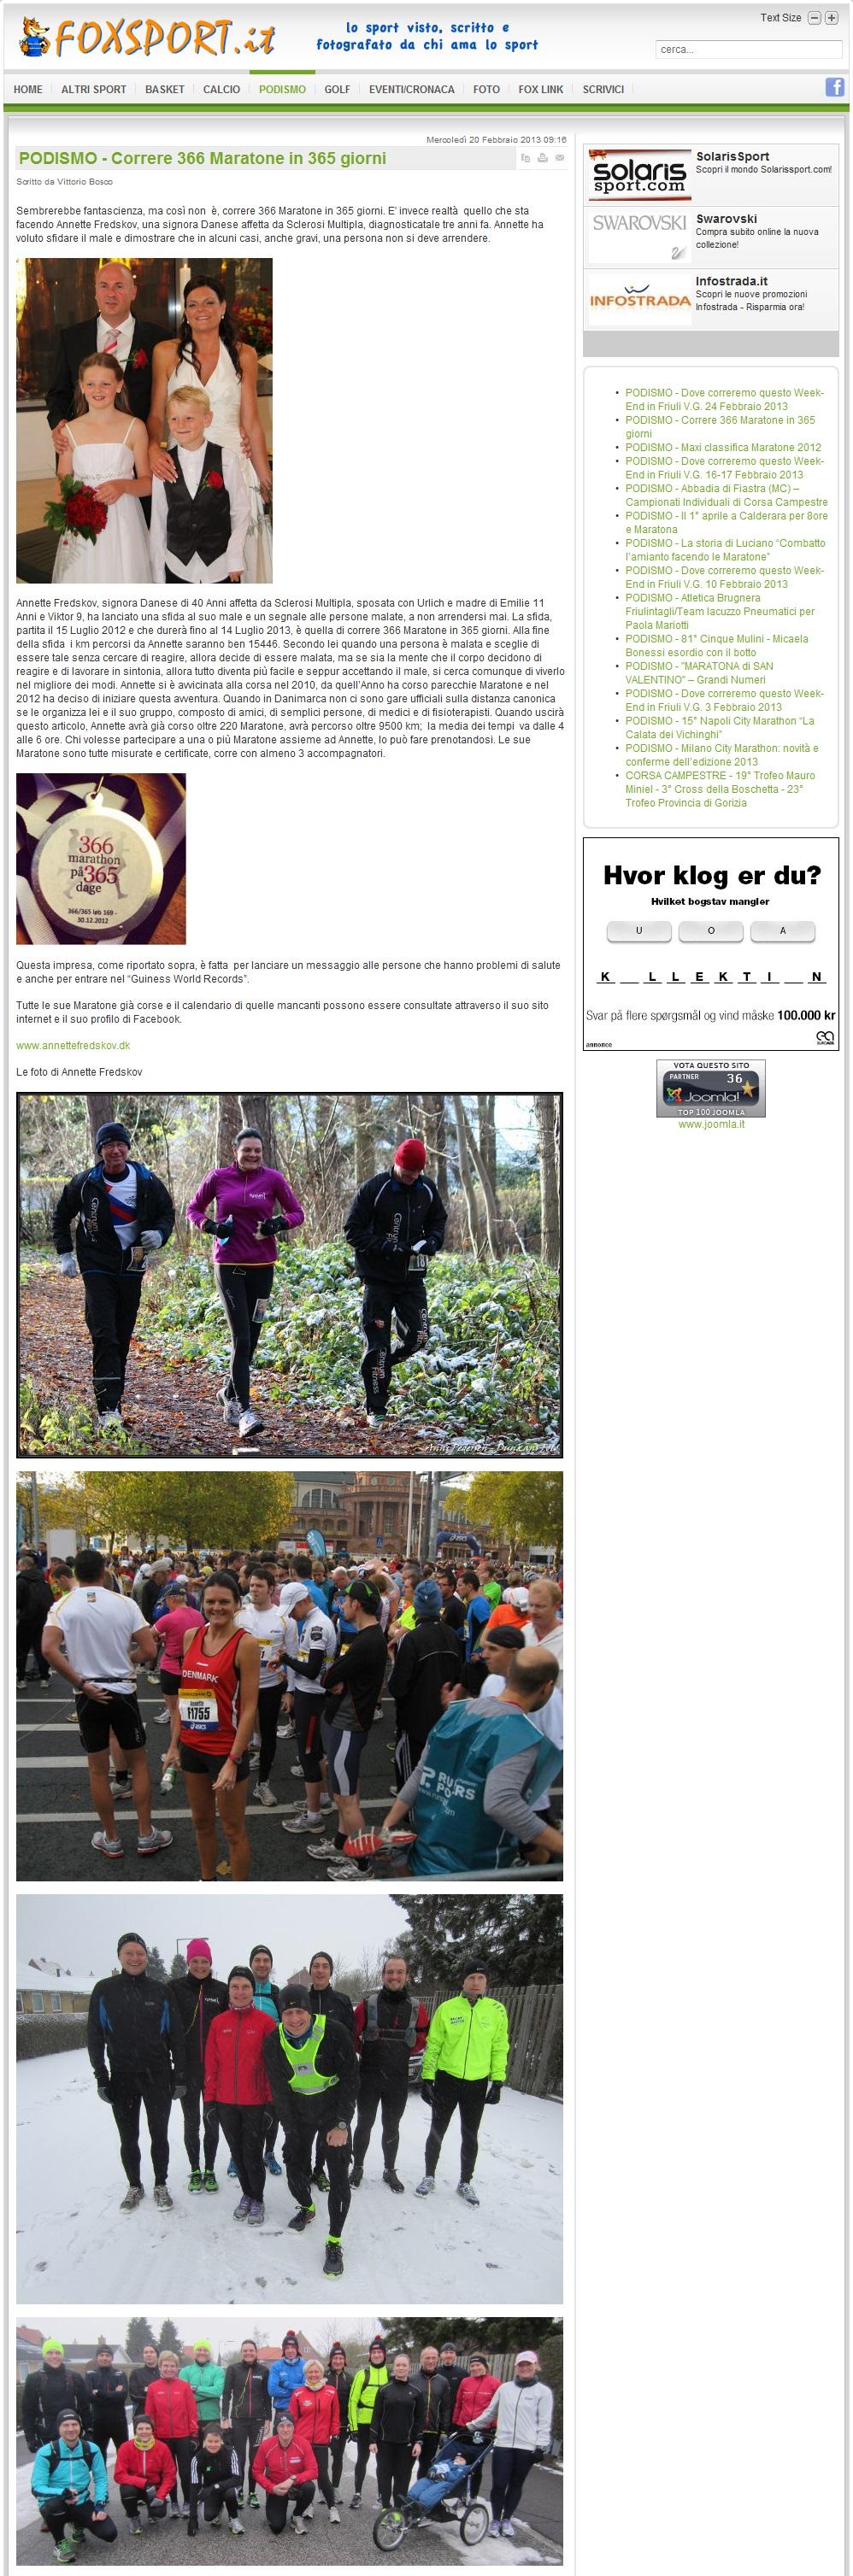 www.foxsport.it 2013.02.20